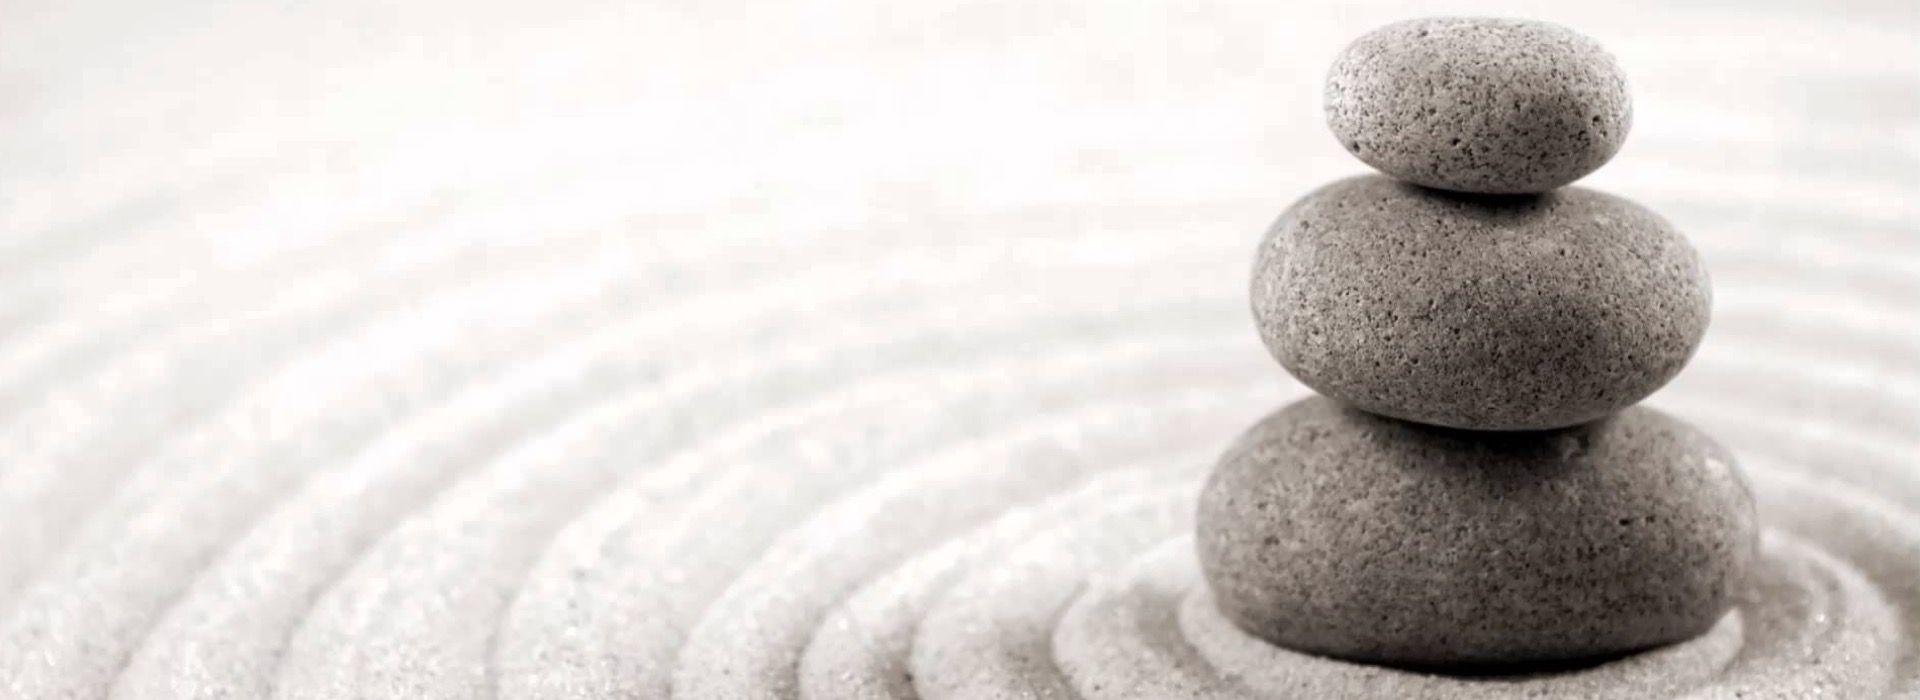 slider terapia holistica